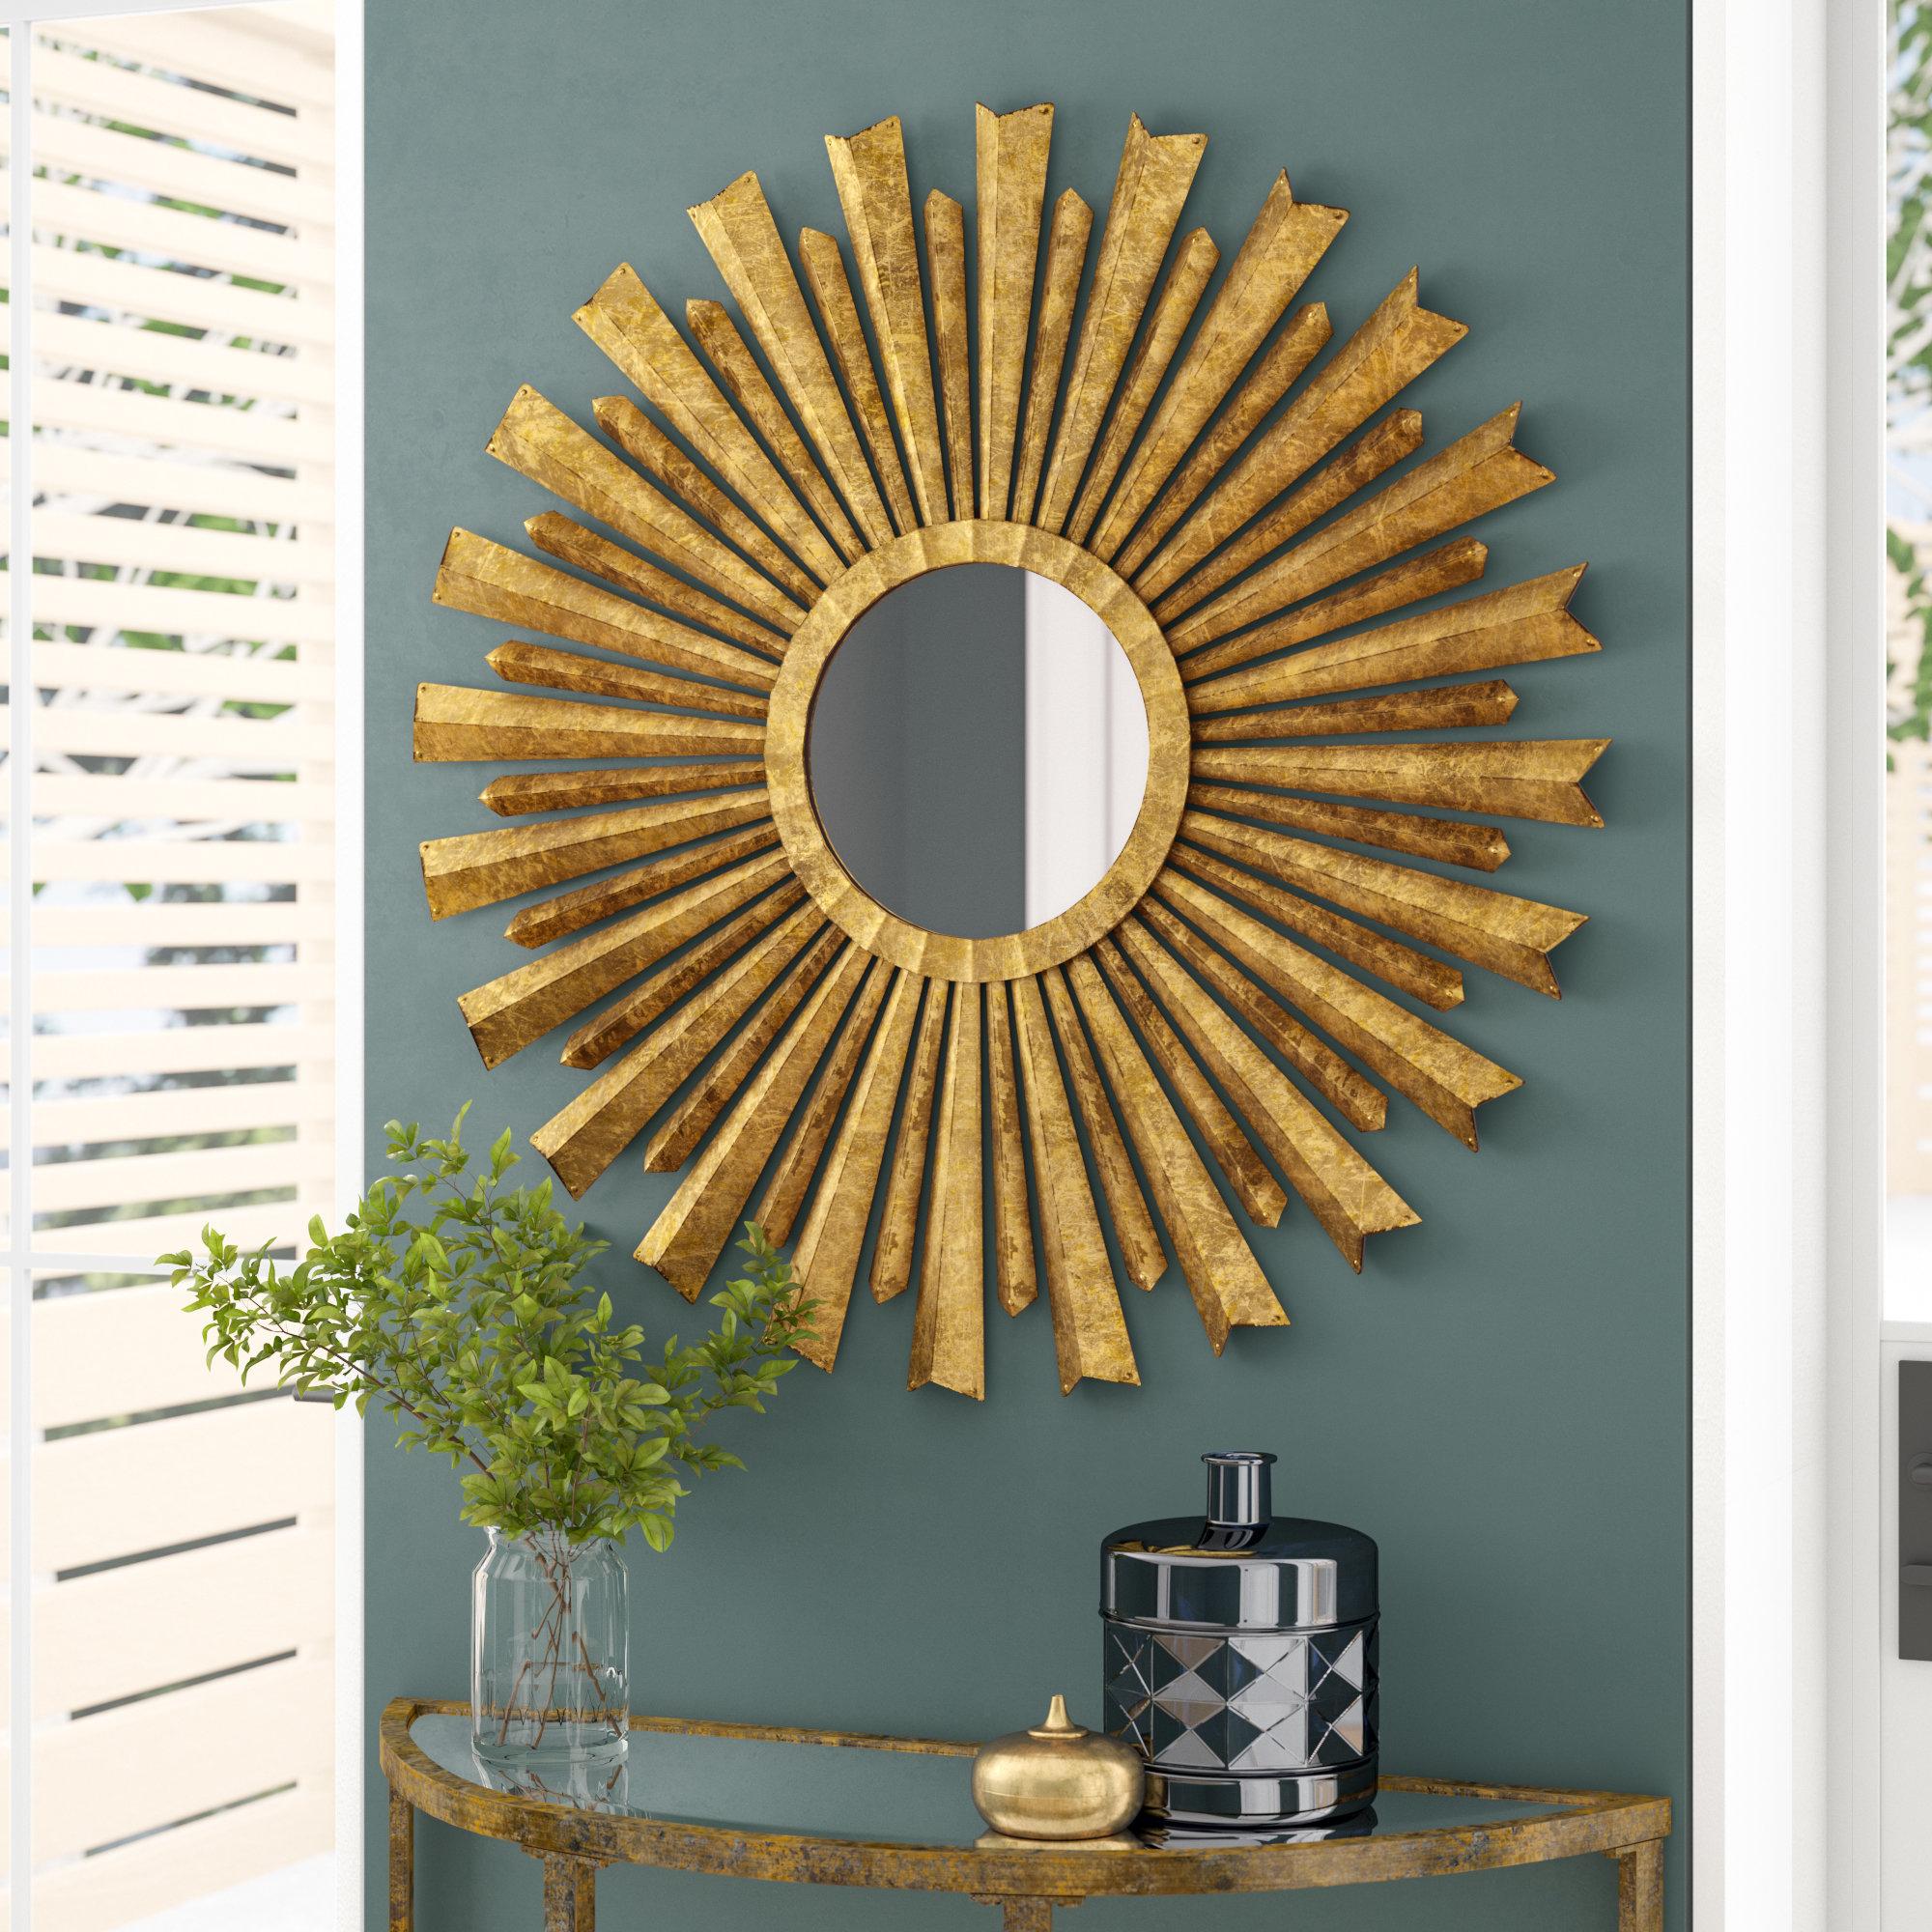 Willa Arlo Interiors Birksgate Sunburst Accent Mirror With Regard To Birksgate Sunburst Accent Mirrors (View 3 of 20)